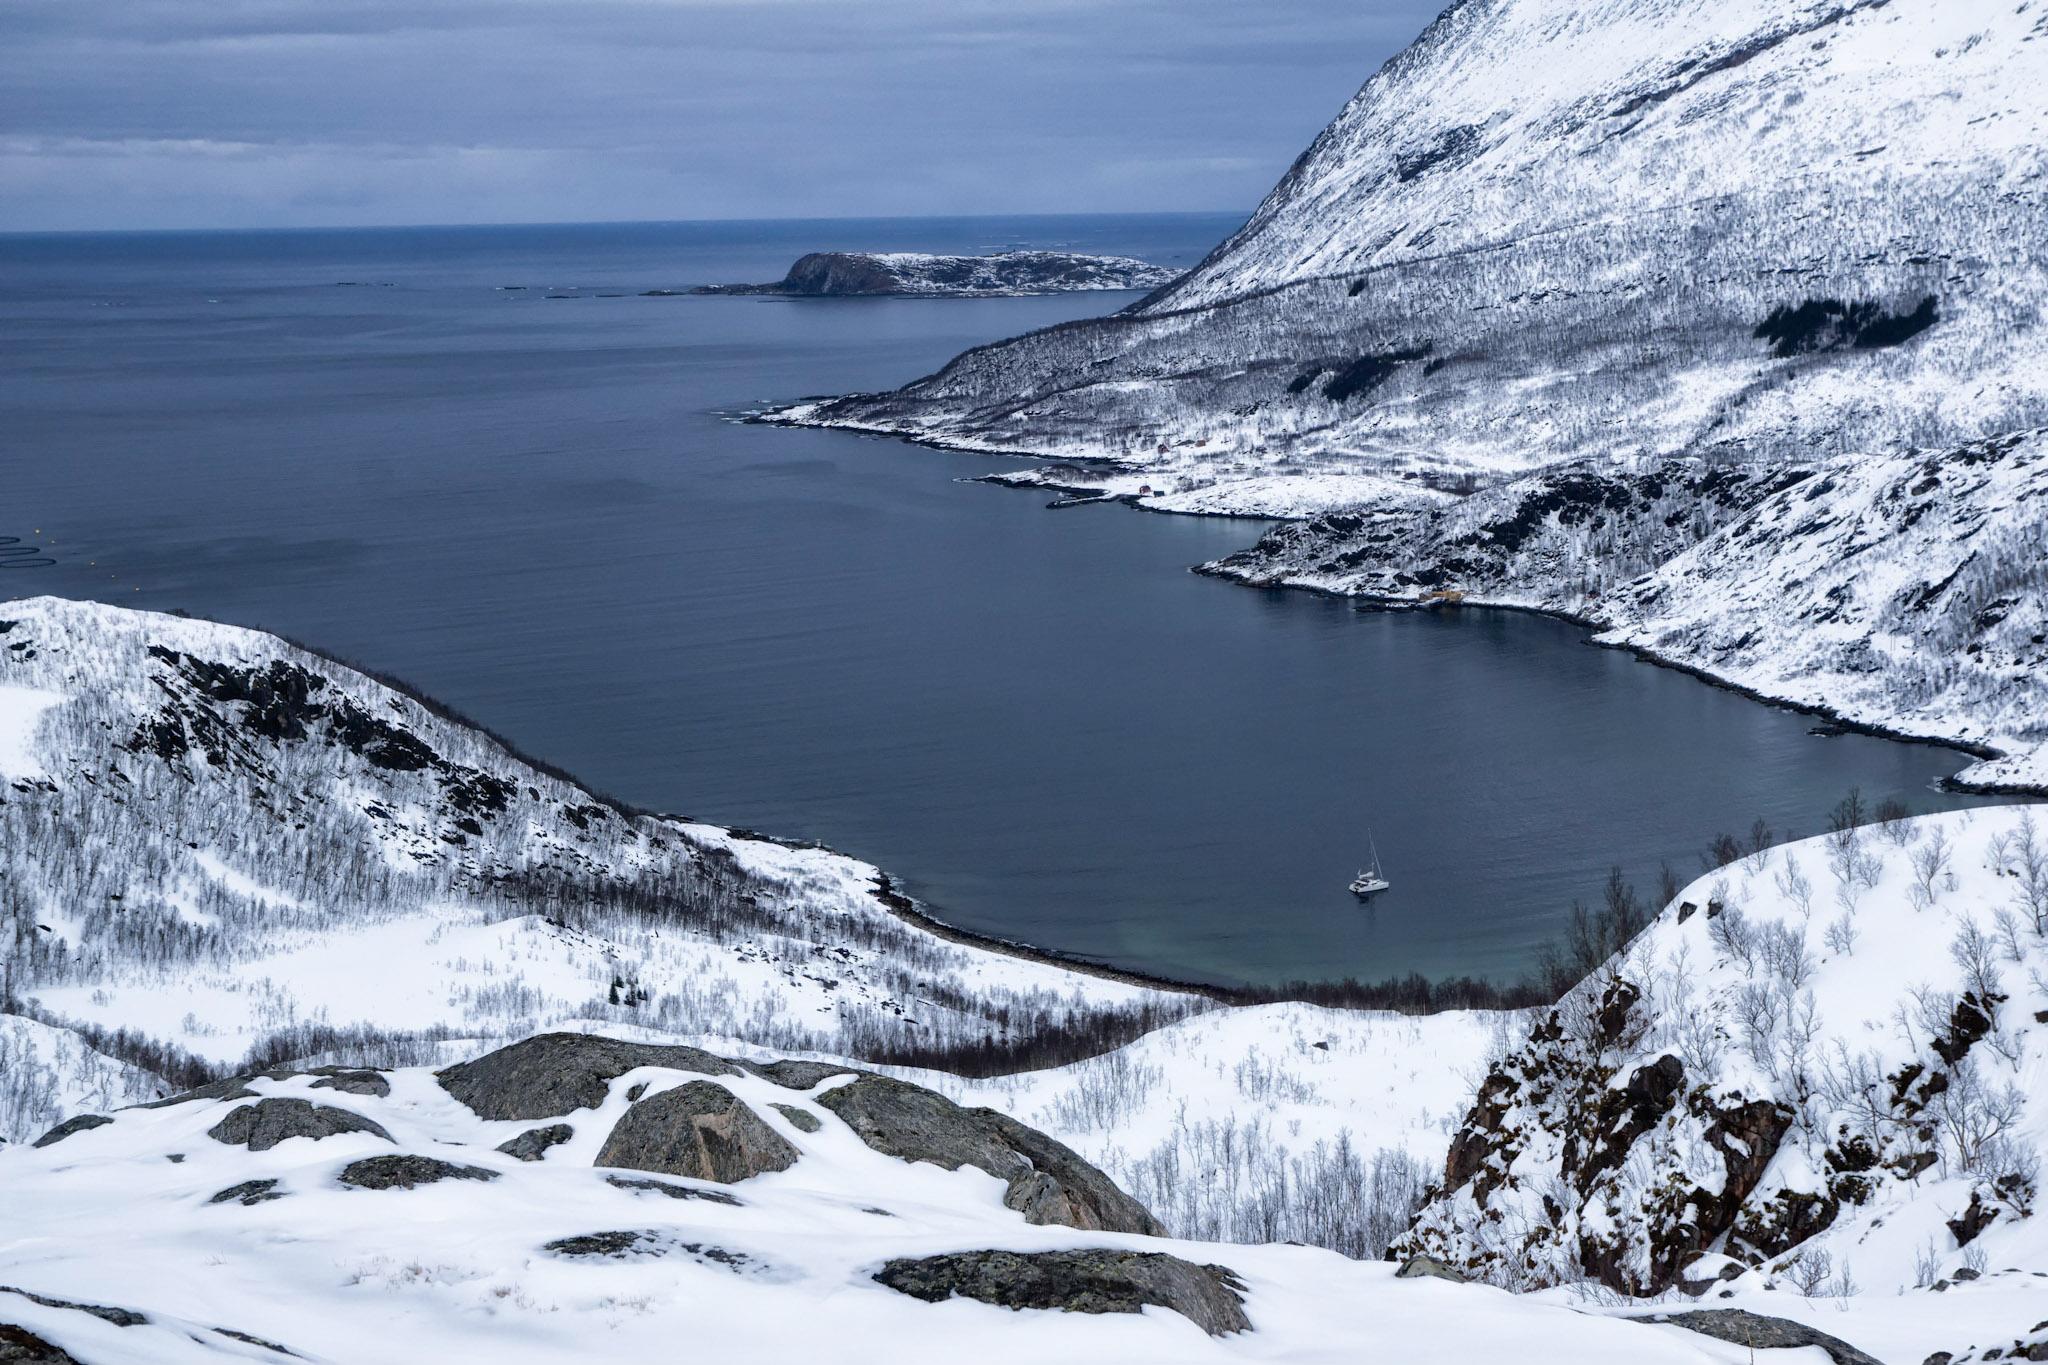 Ski voile dans les fjords du grand nord Ski voile dans les fjords du grand nord Ski voile dans les f